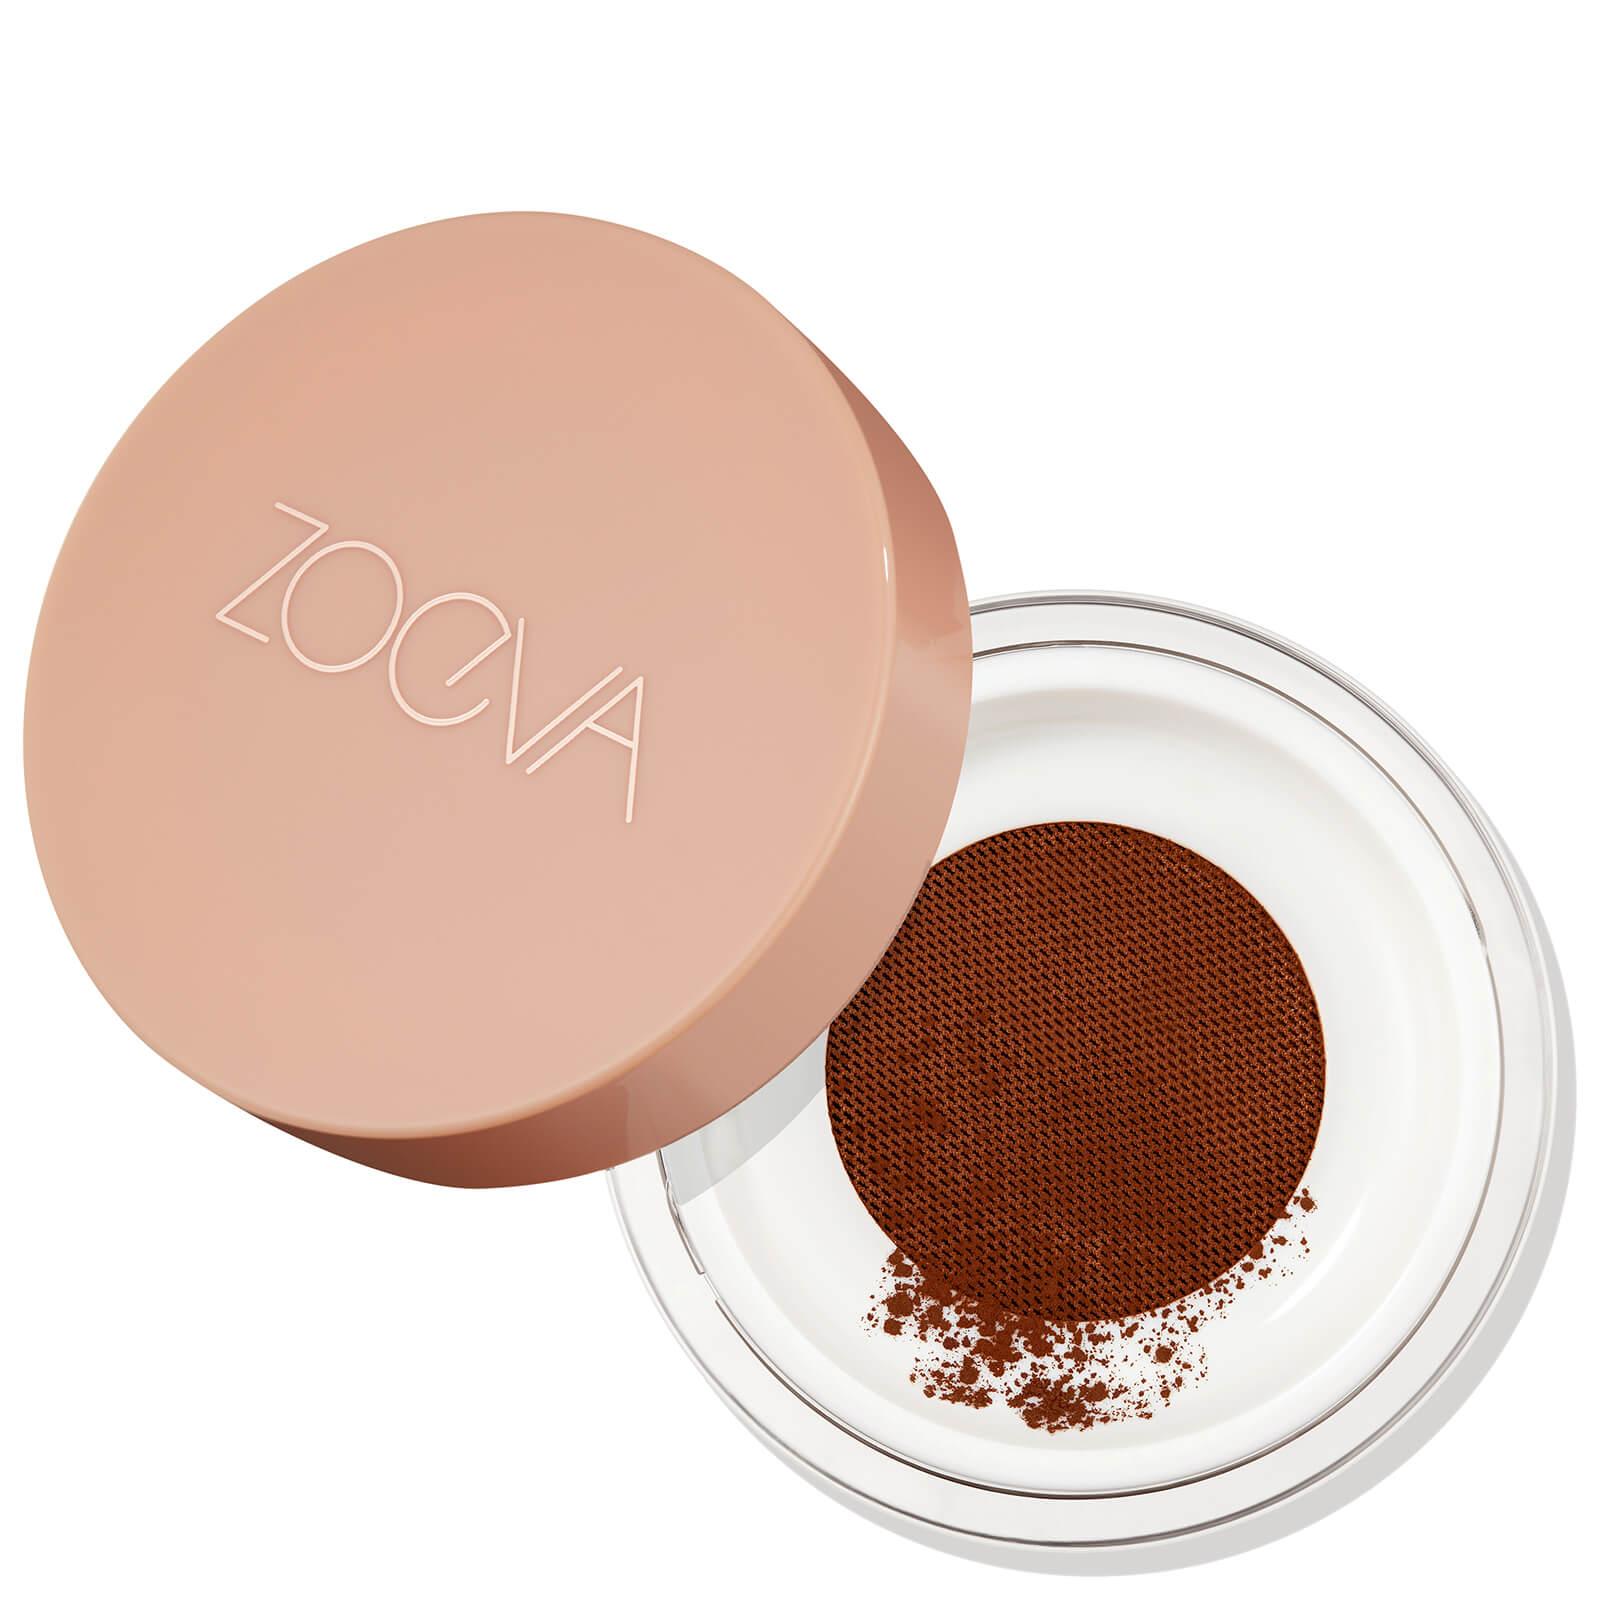 Купить ZOEVA Authentik Skin Finishing Powder 14g (Various Shades) - Magnificient